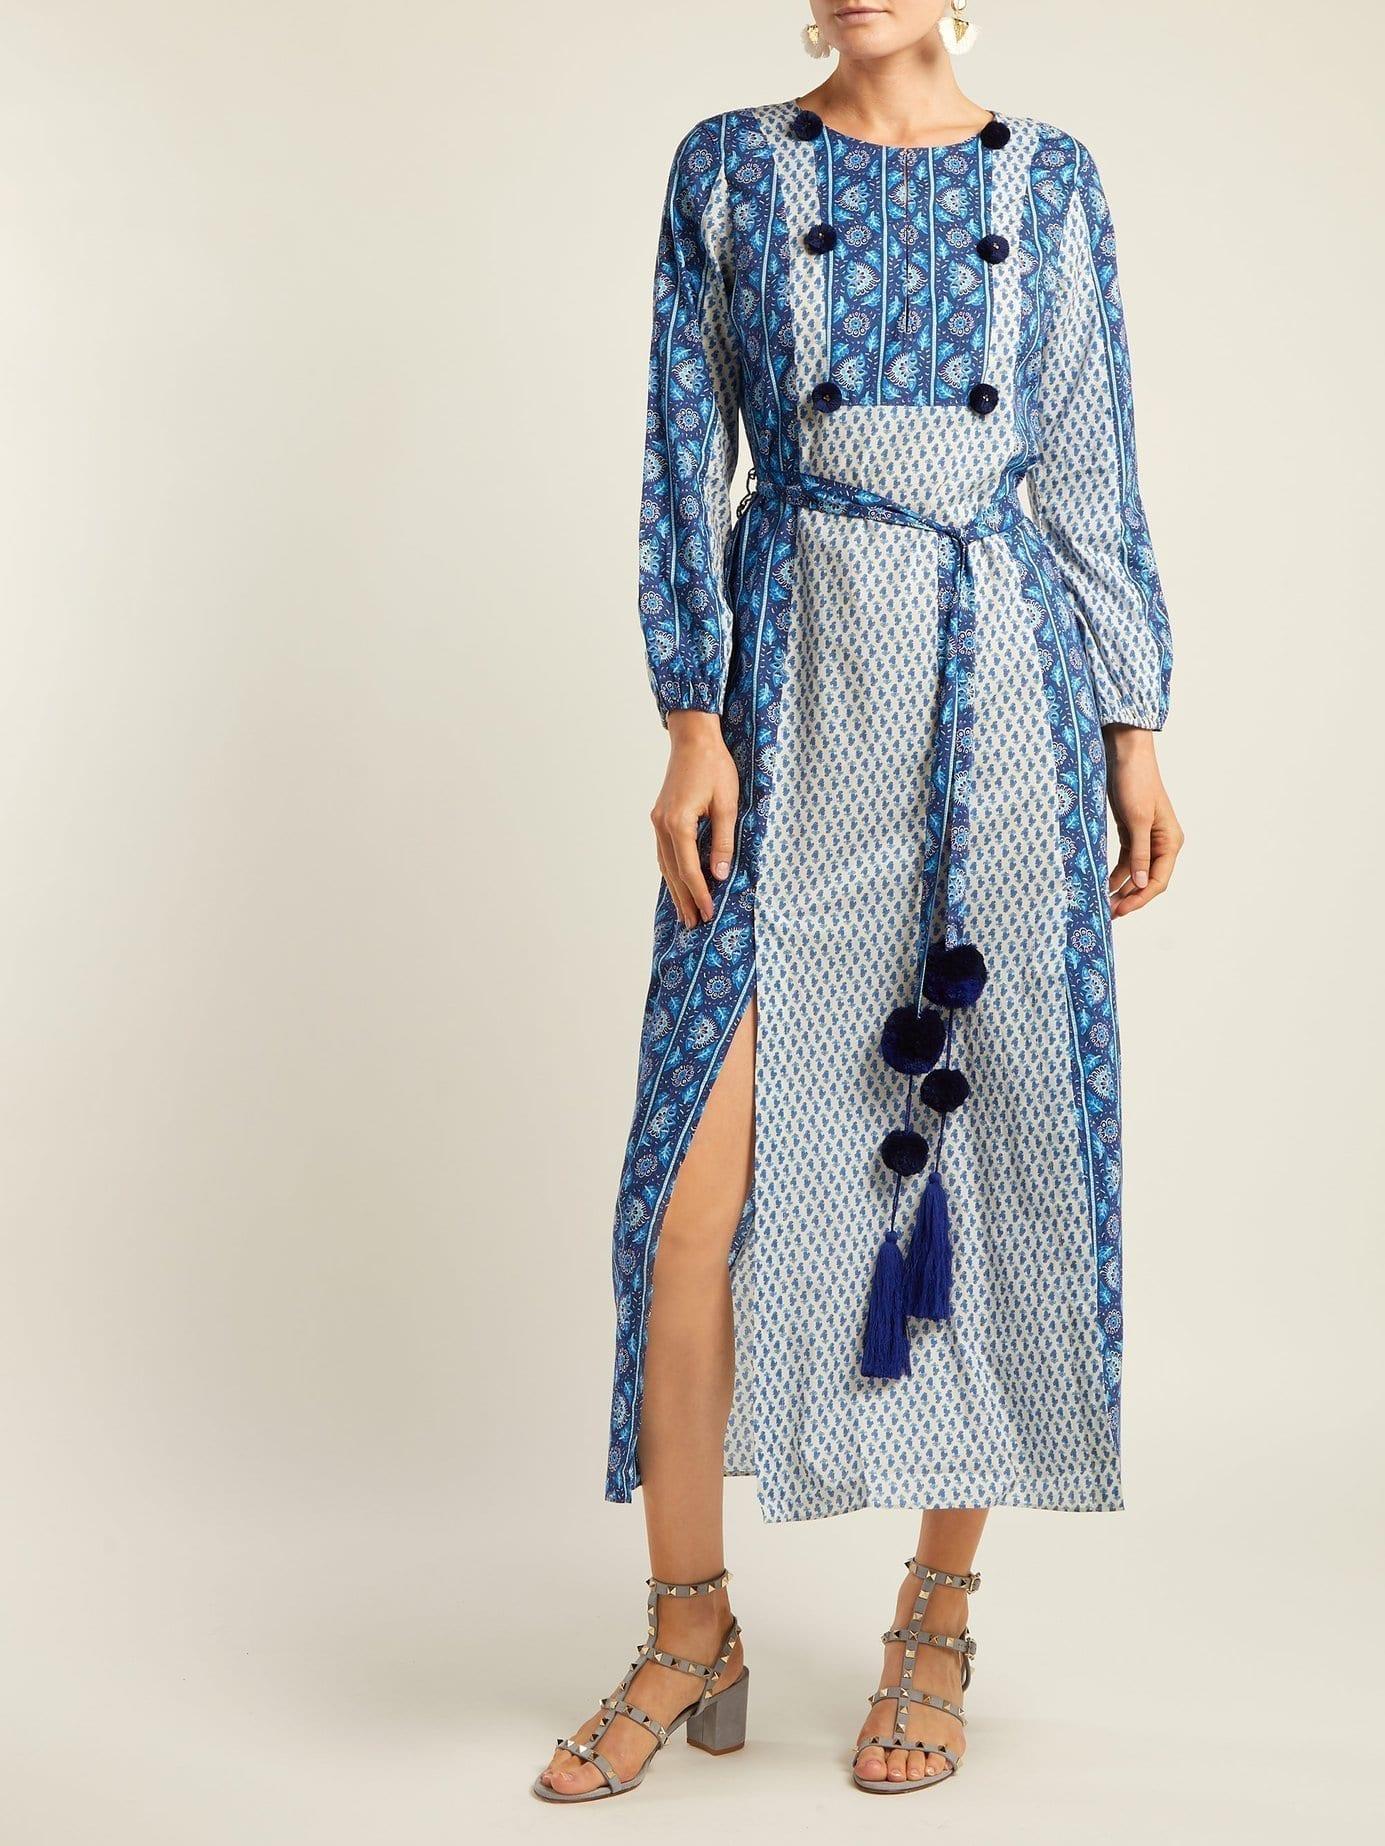 FIGUE Ravenna Cotton Maxi Blue Dress